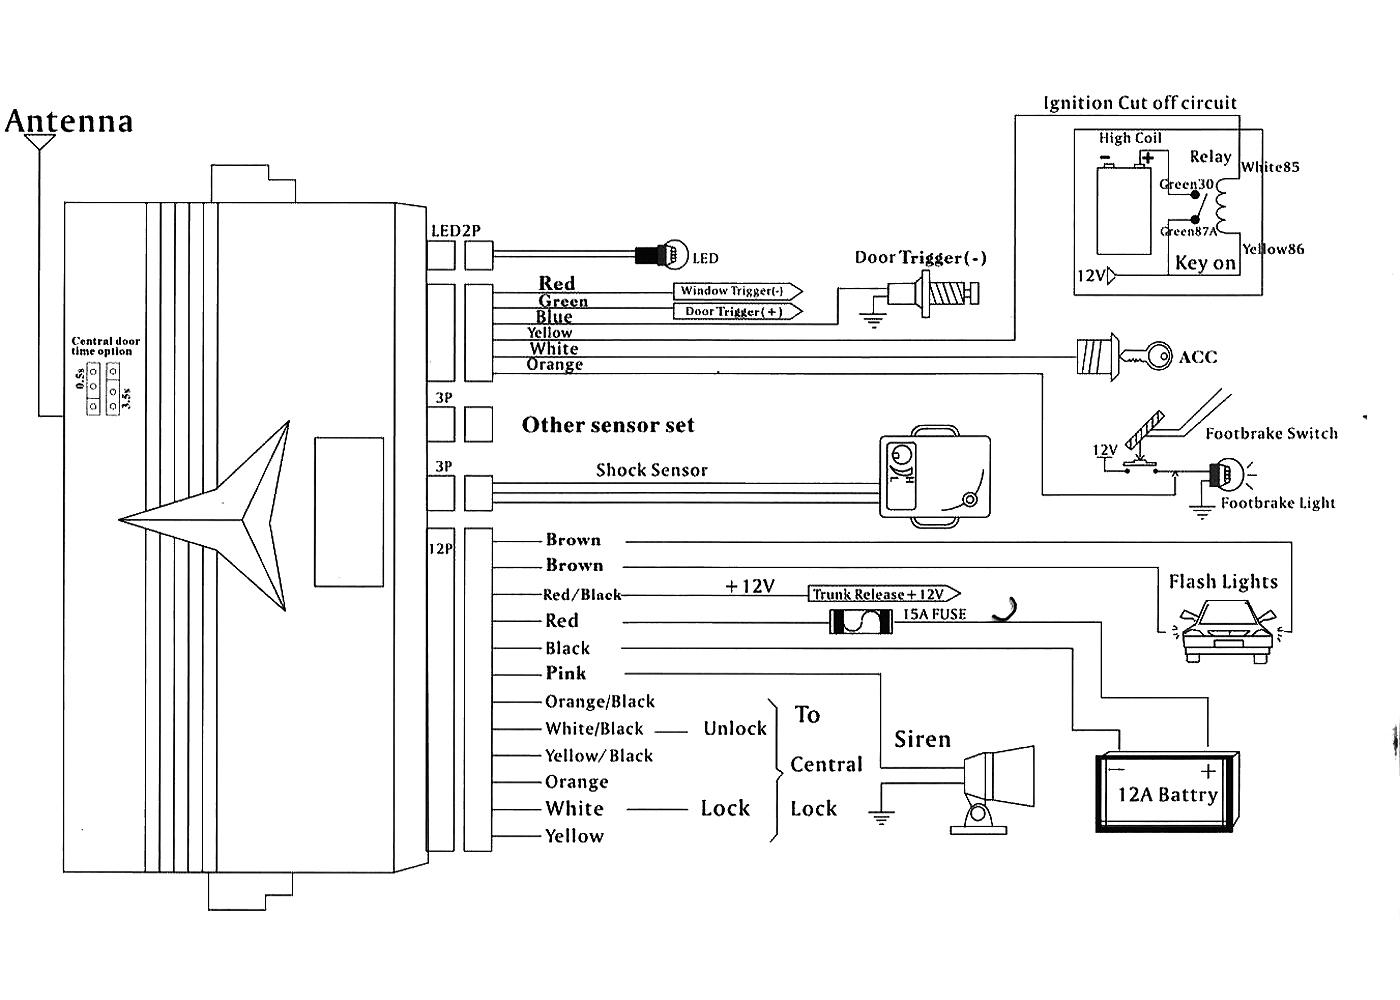 Wiring Diagram Of Car Alarm - Wiring Diagram Detailed - Car Alarm Wiring Diagram